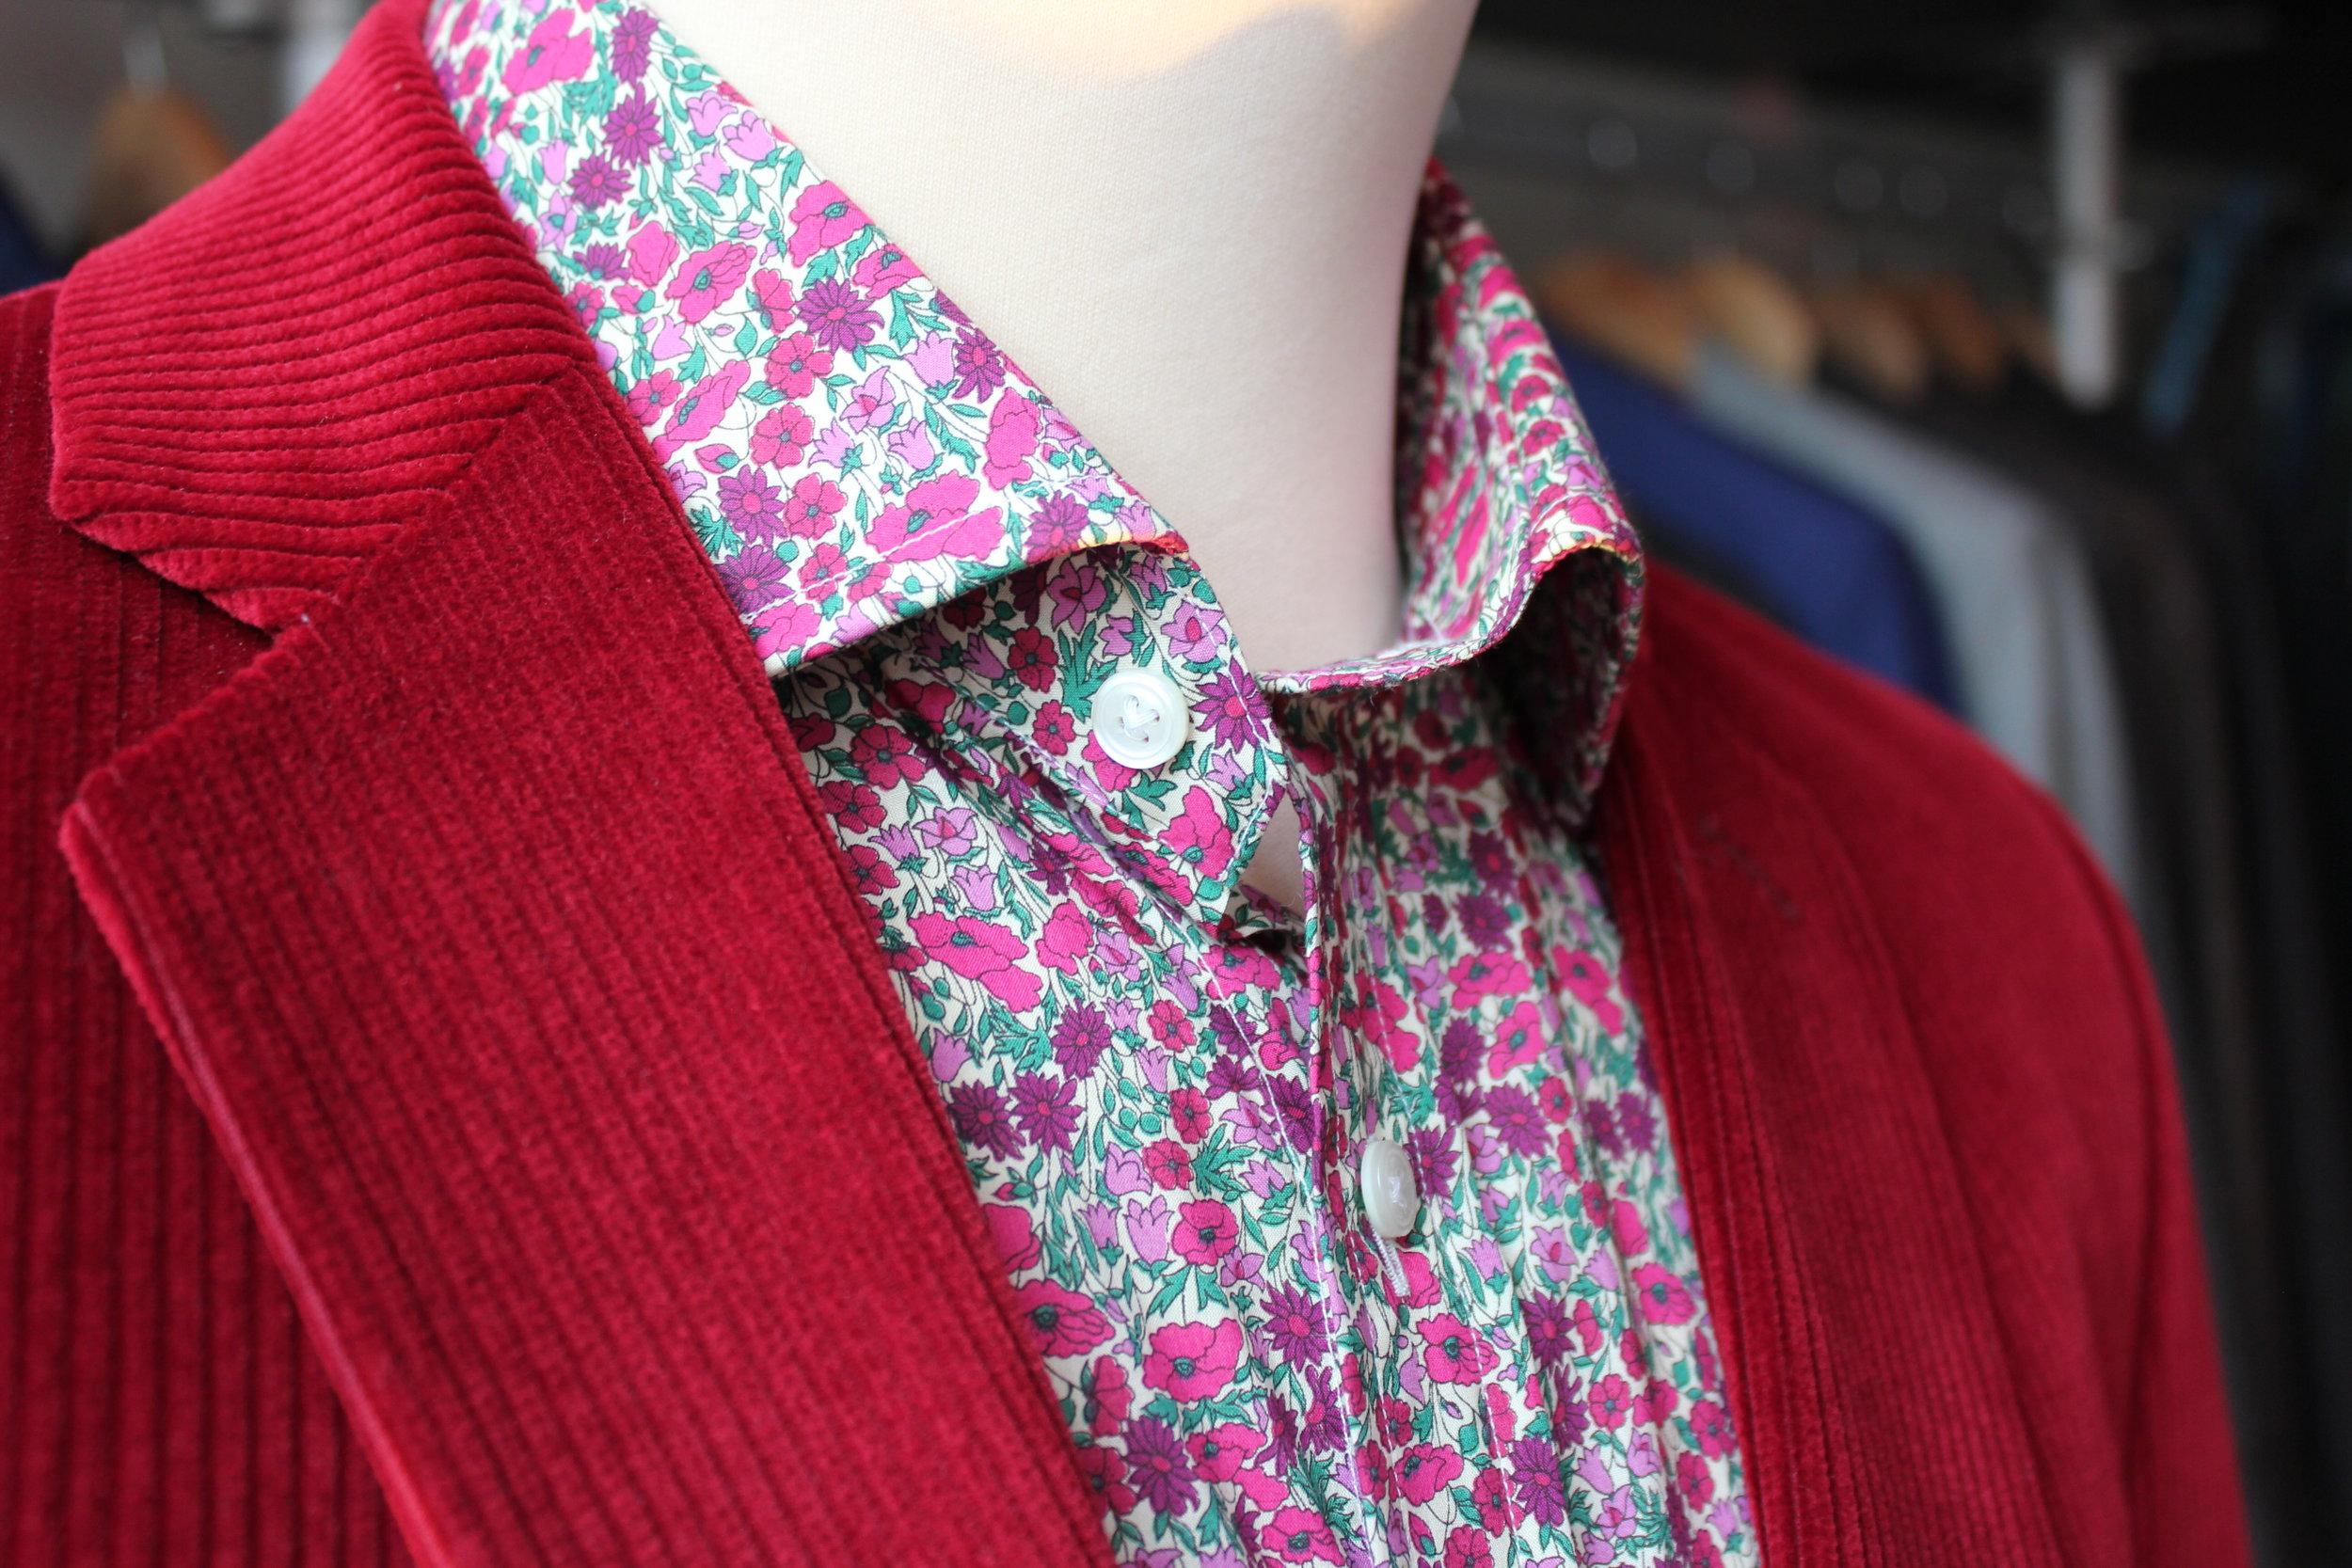 red-cord-corduroy-dugdale-jacket-british-bespoke-tailoring-liberty-print-shirt-tana-lawn-all-uk-made-floral.JPG